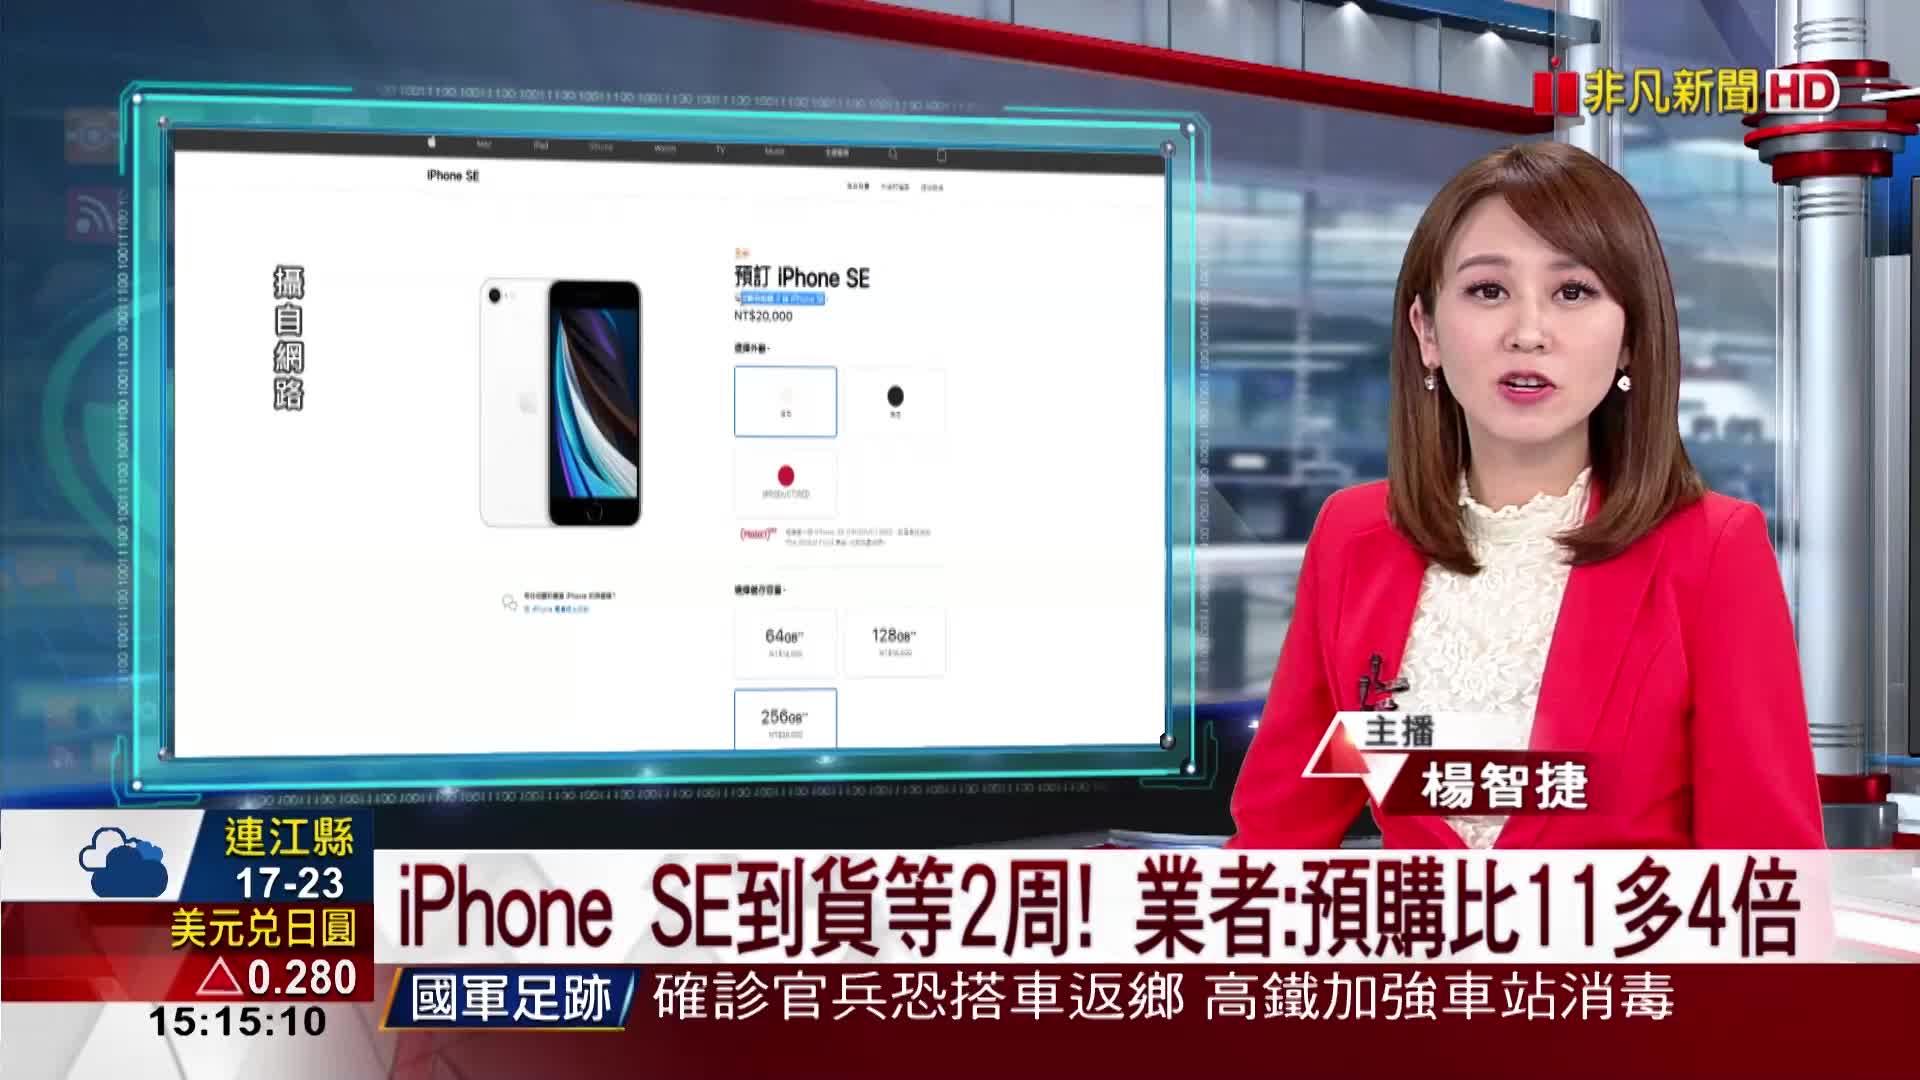 iPhone SE到貨等2周! 業者:預購比11多4倍